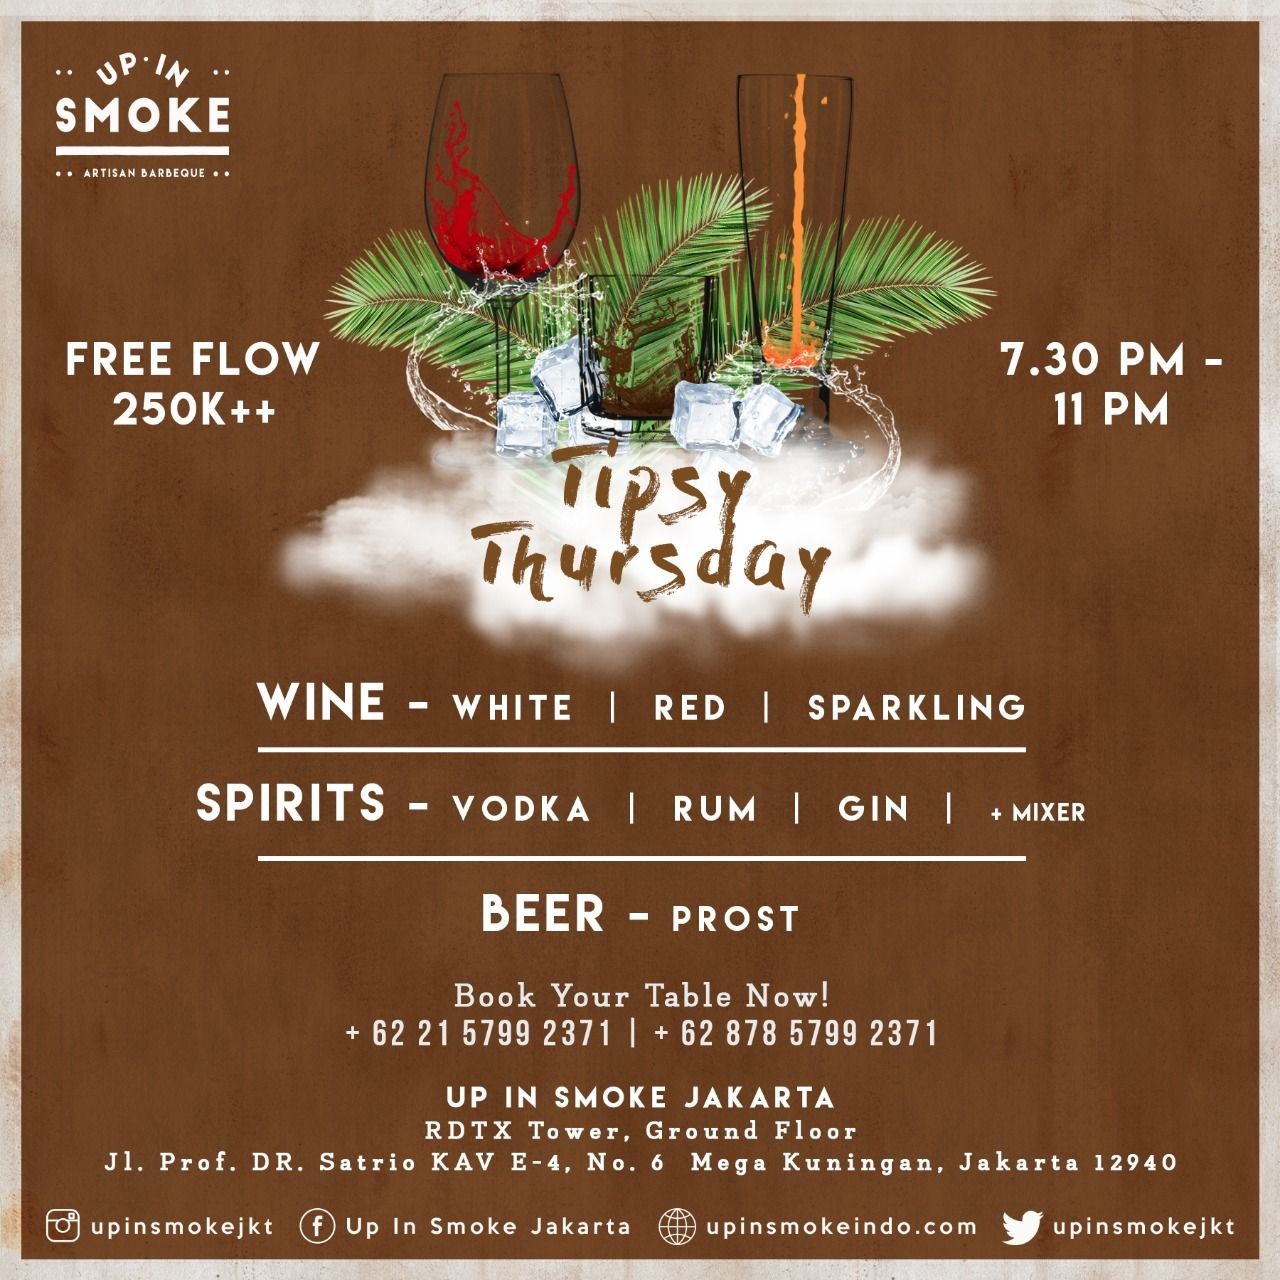 •TIPSY THURSDAY• TOMORROW! Up In Smoke Jakarta offering 2